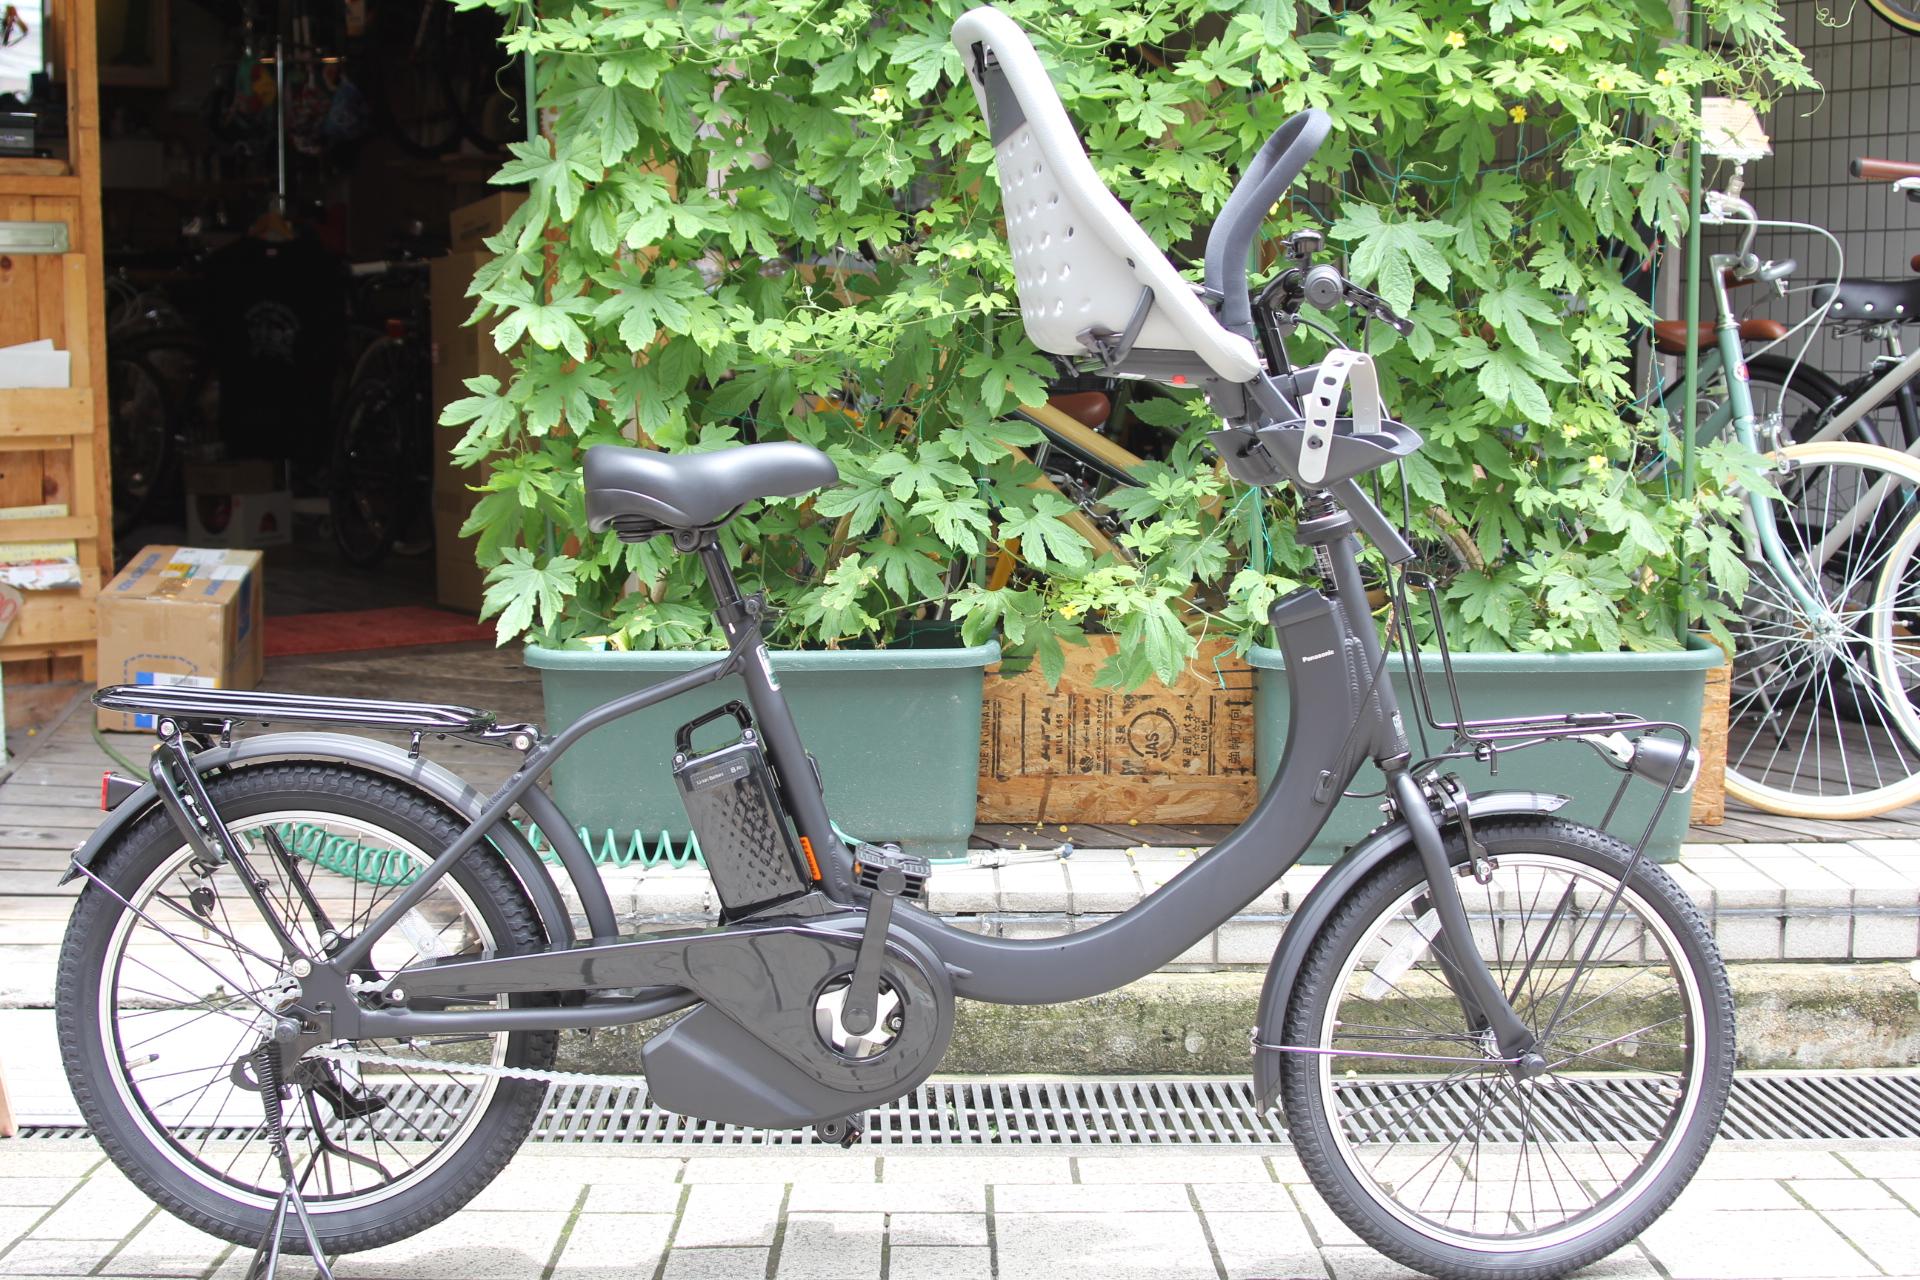 Panasonic『SW』必要最小限の機能を備えたコストパフォーマンスに優れた電動アシスト自転車